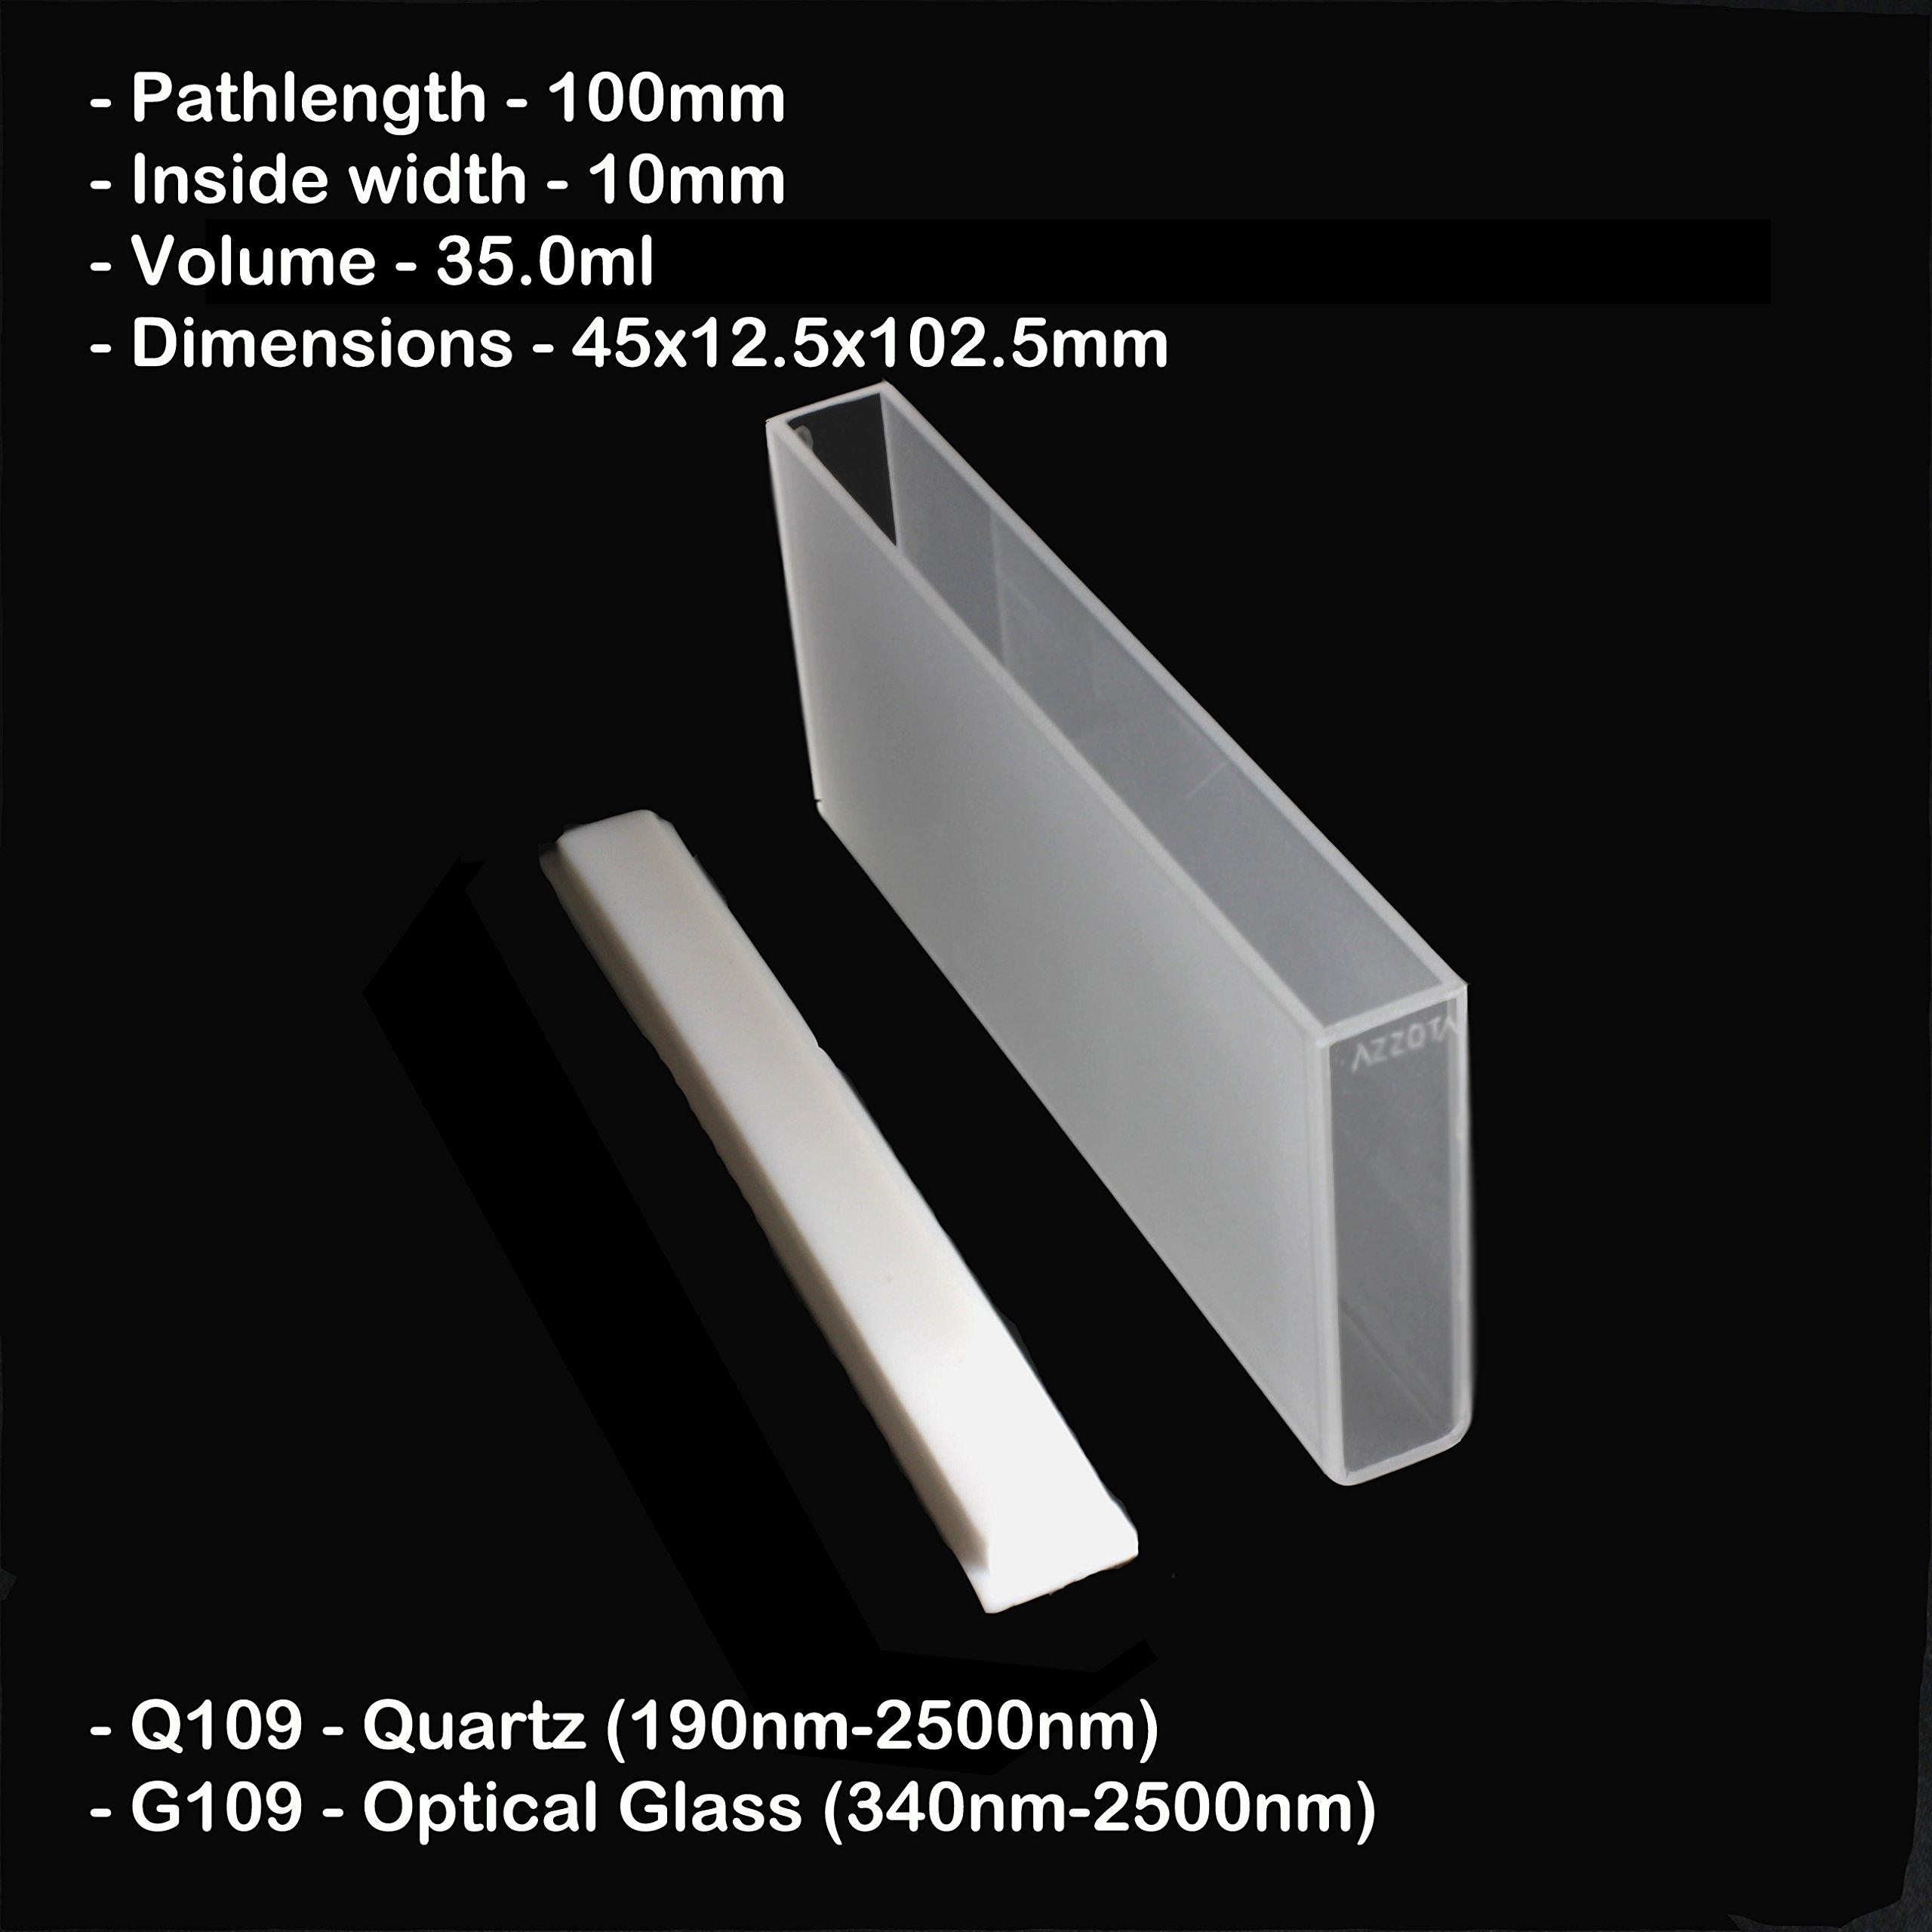 100mm Pathlength Optical Glass Cuvettes - 35ml